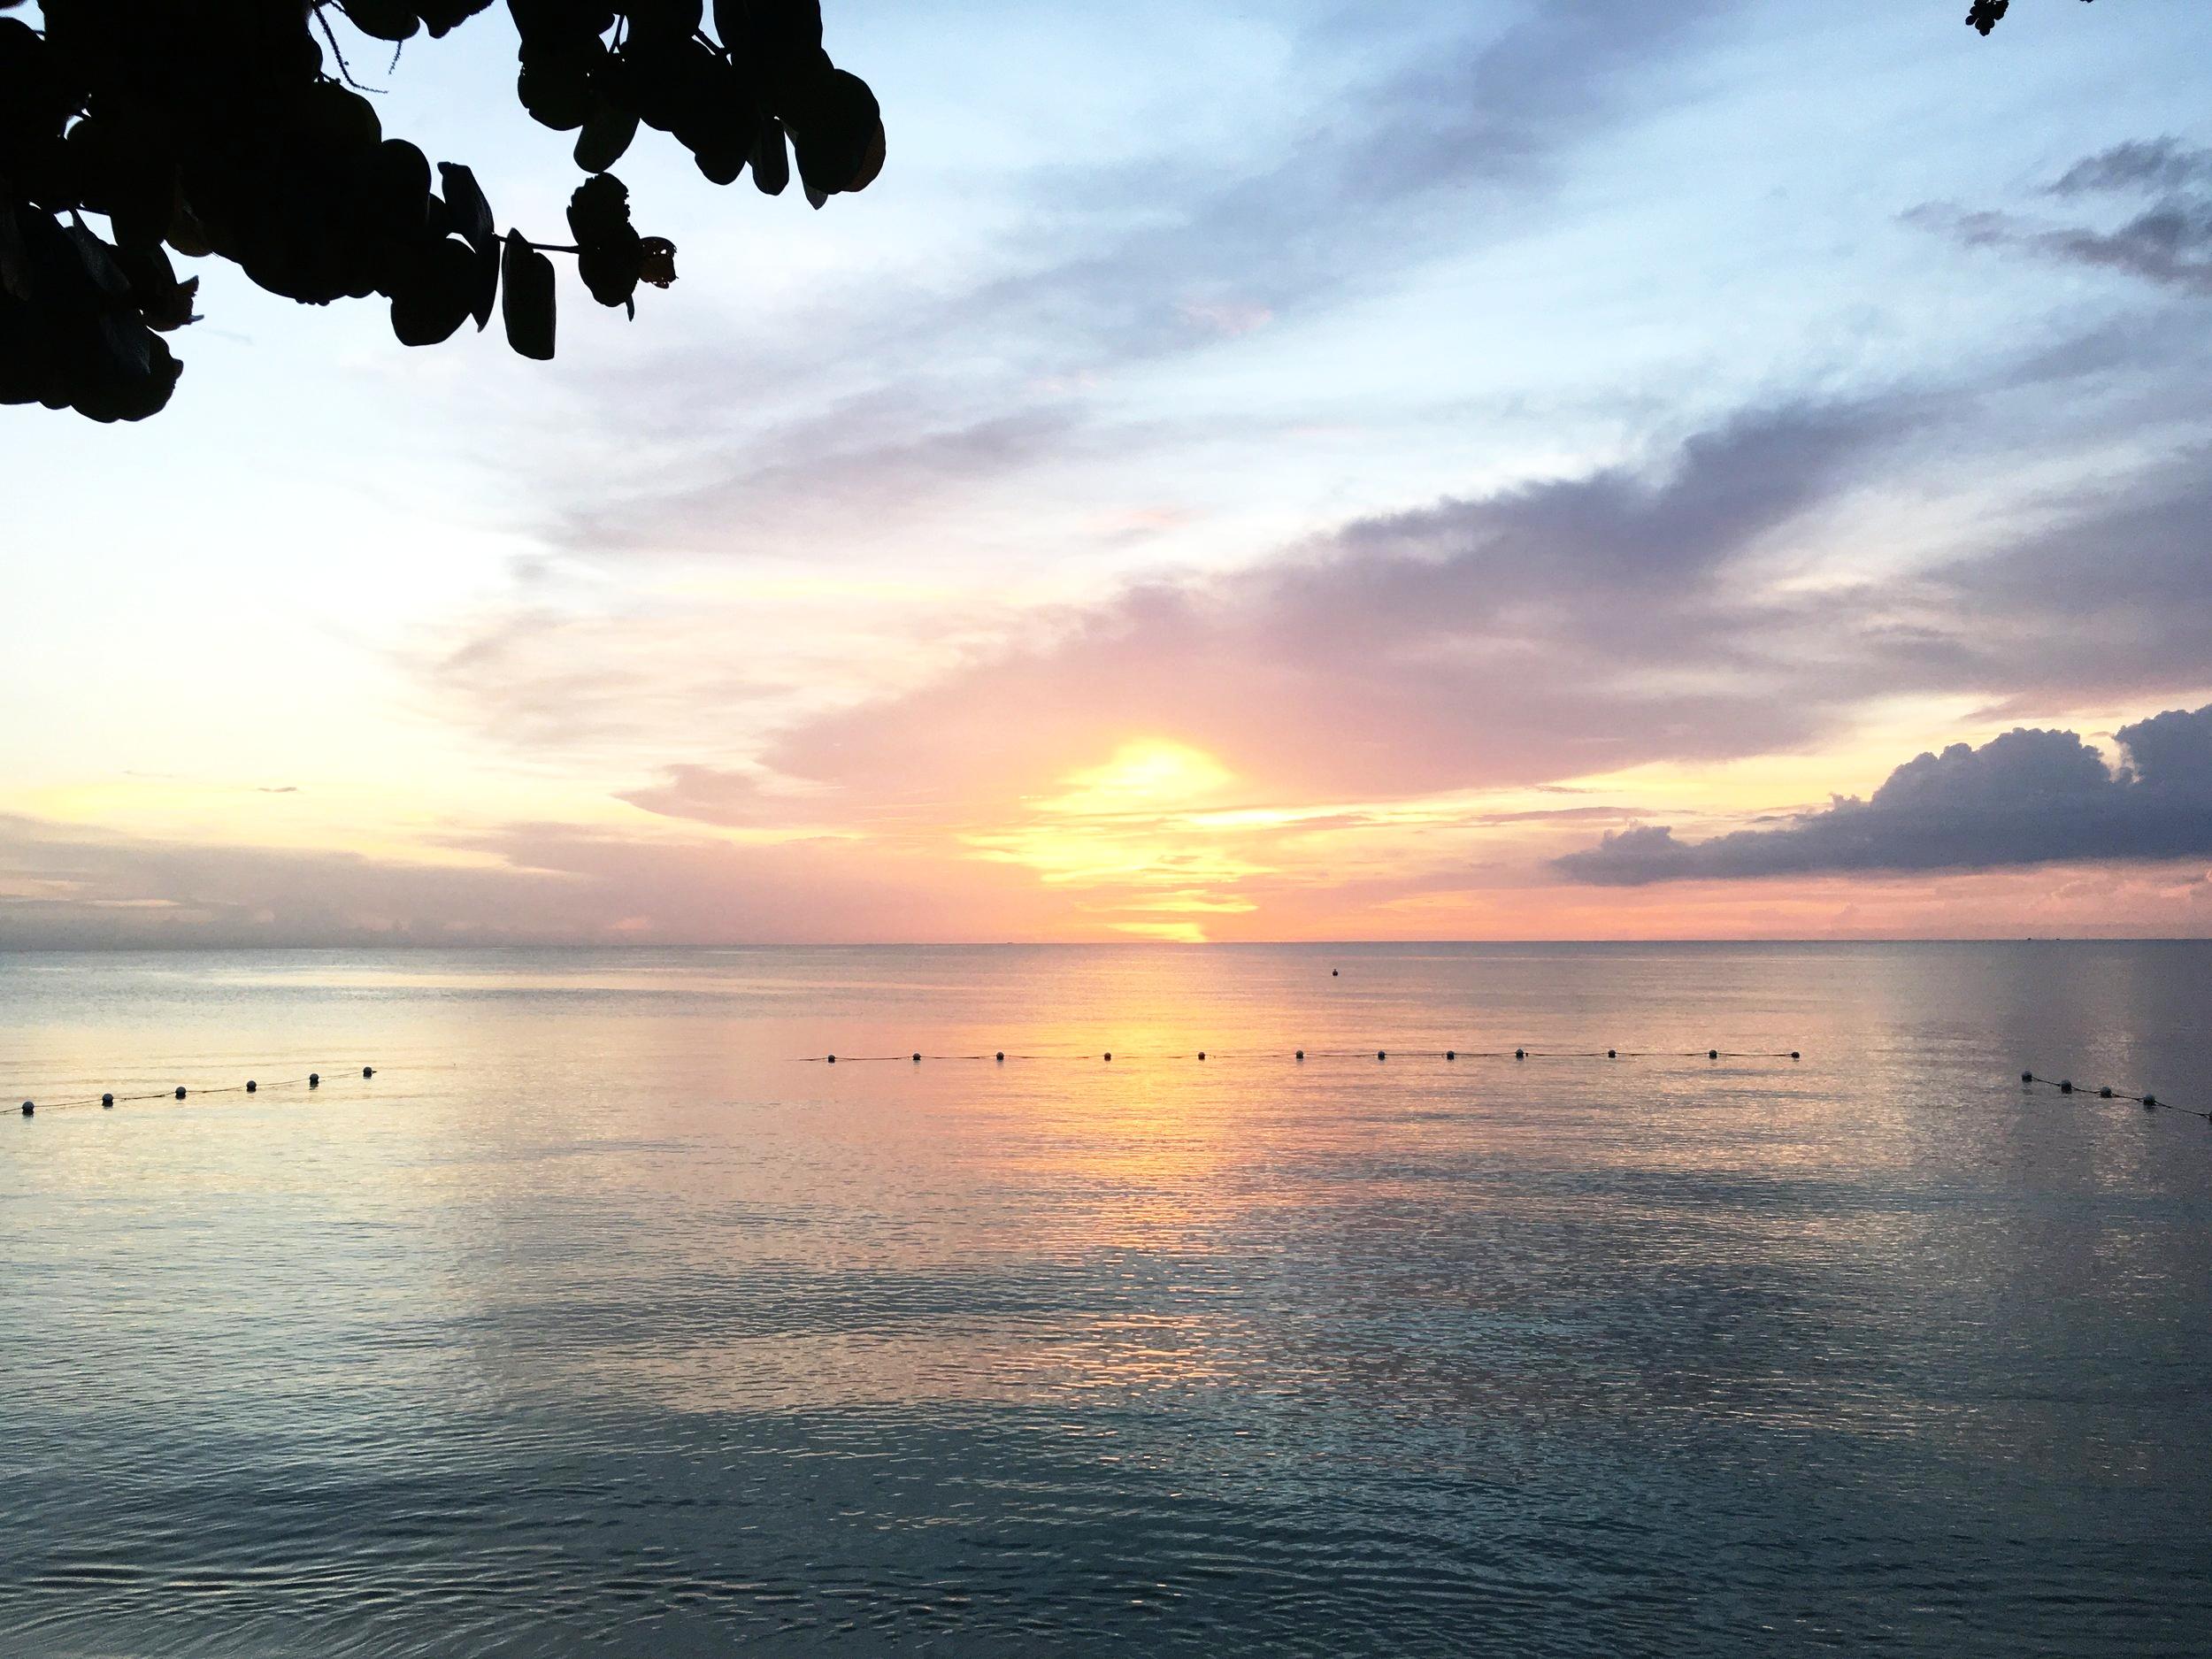 Peaceful Sunset—Negril, Jamaica